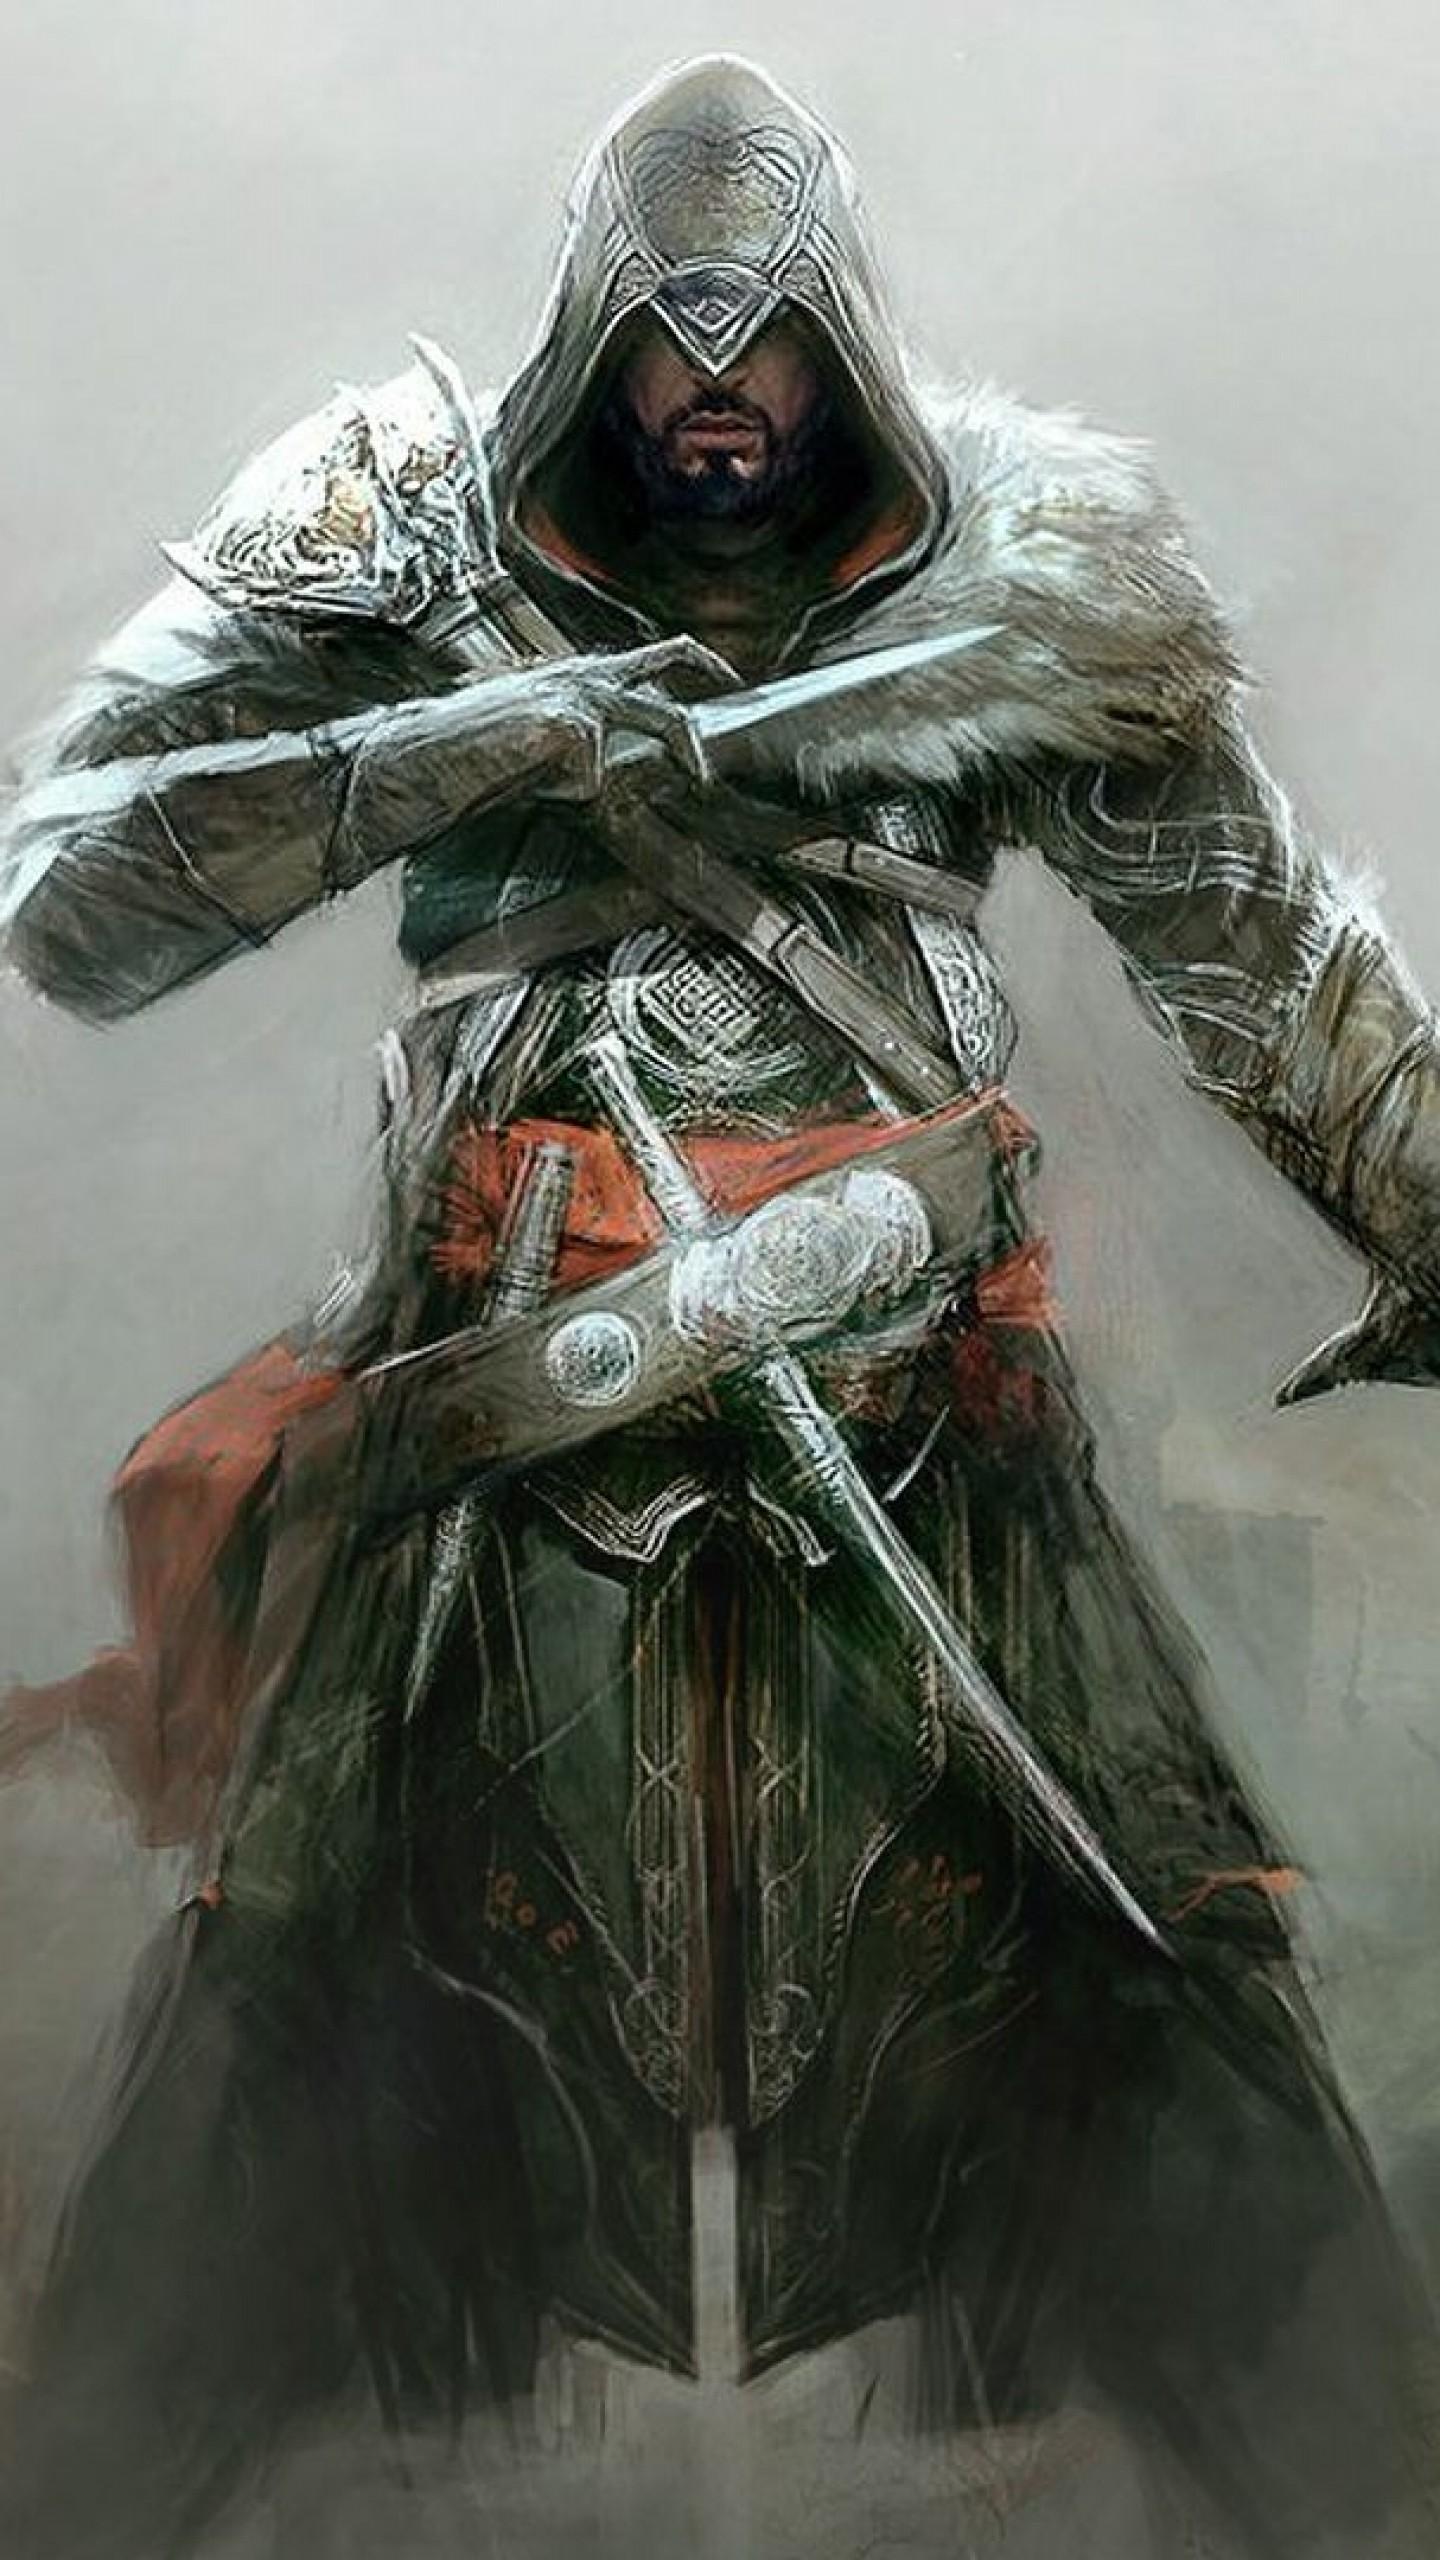 Preview wallpaper assassins creed revelations, desmond miles, knifes, arm,  picture 1440×2560